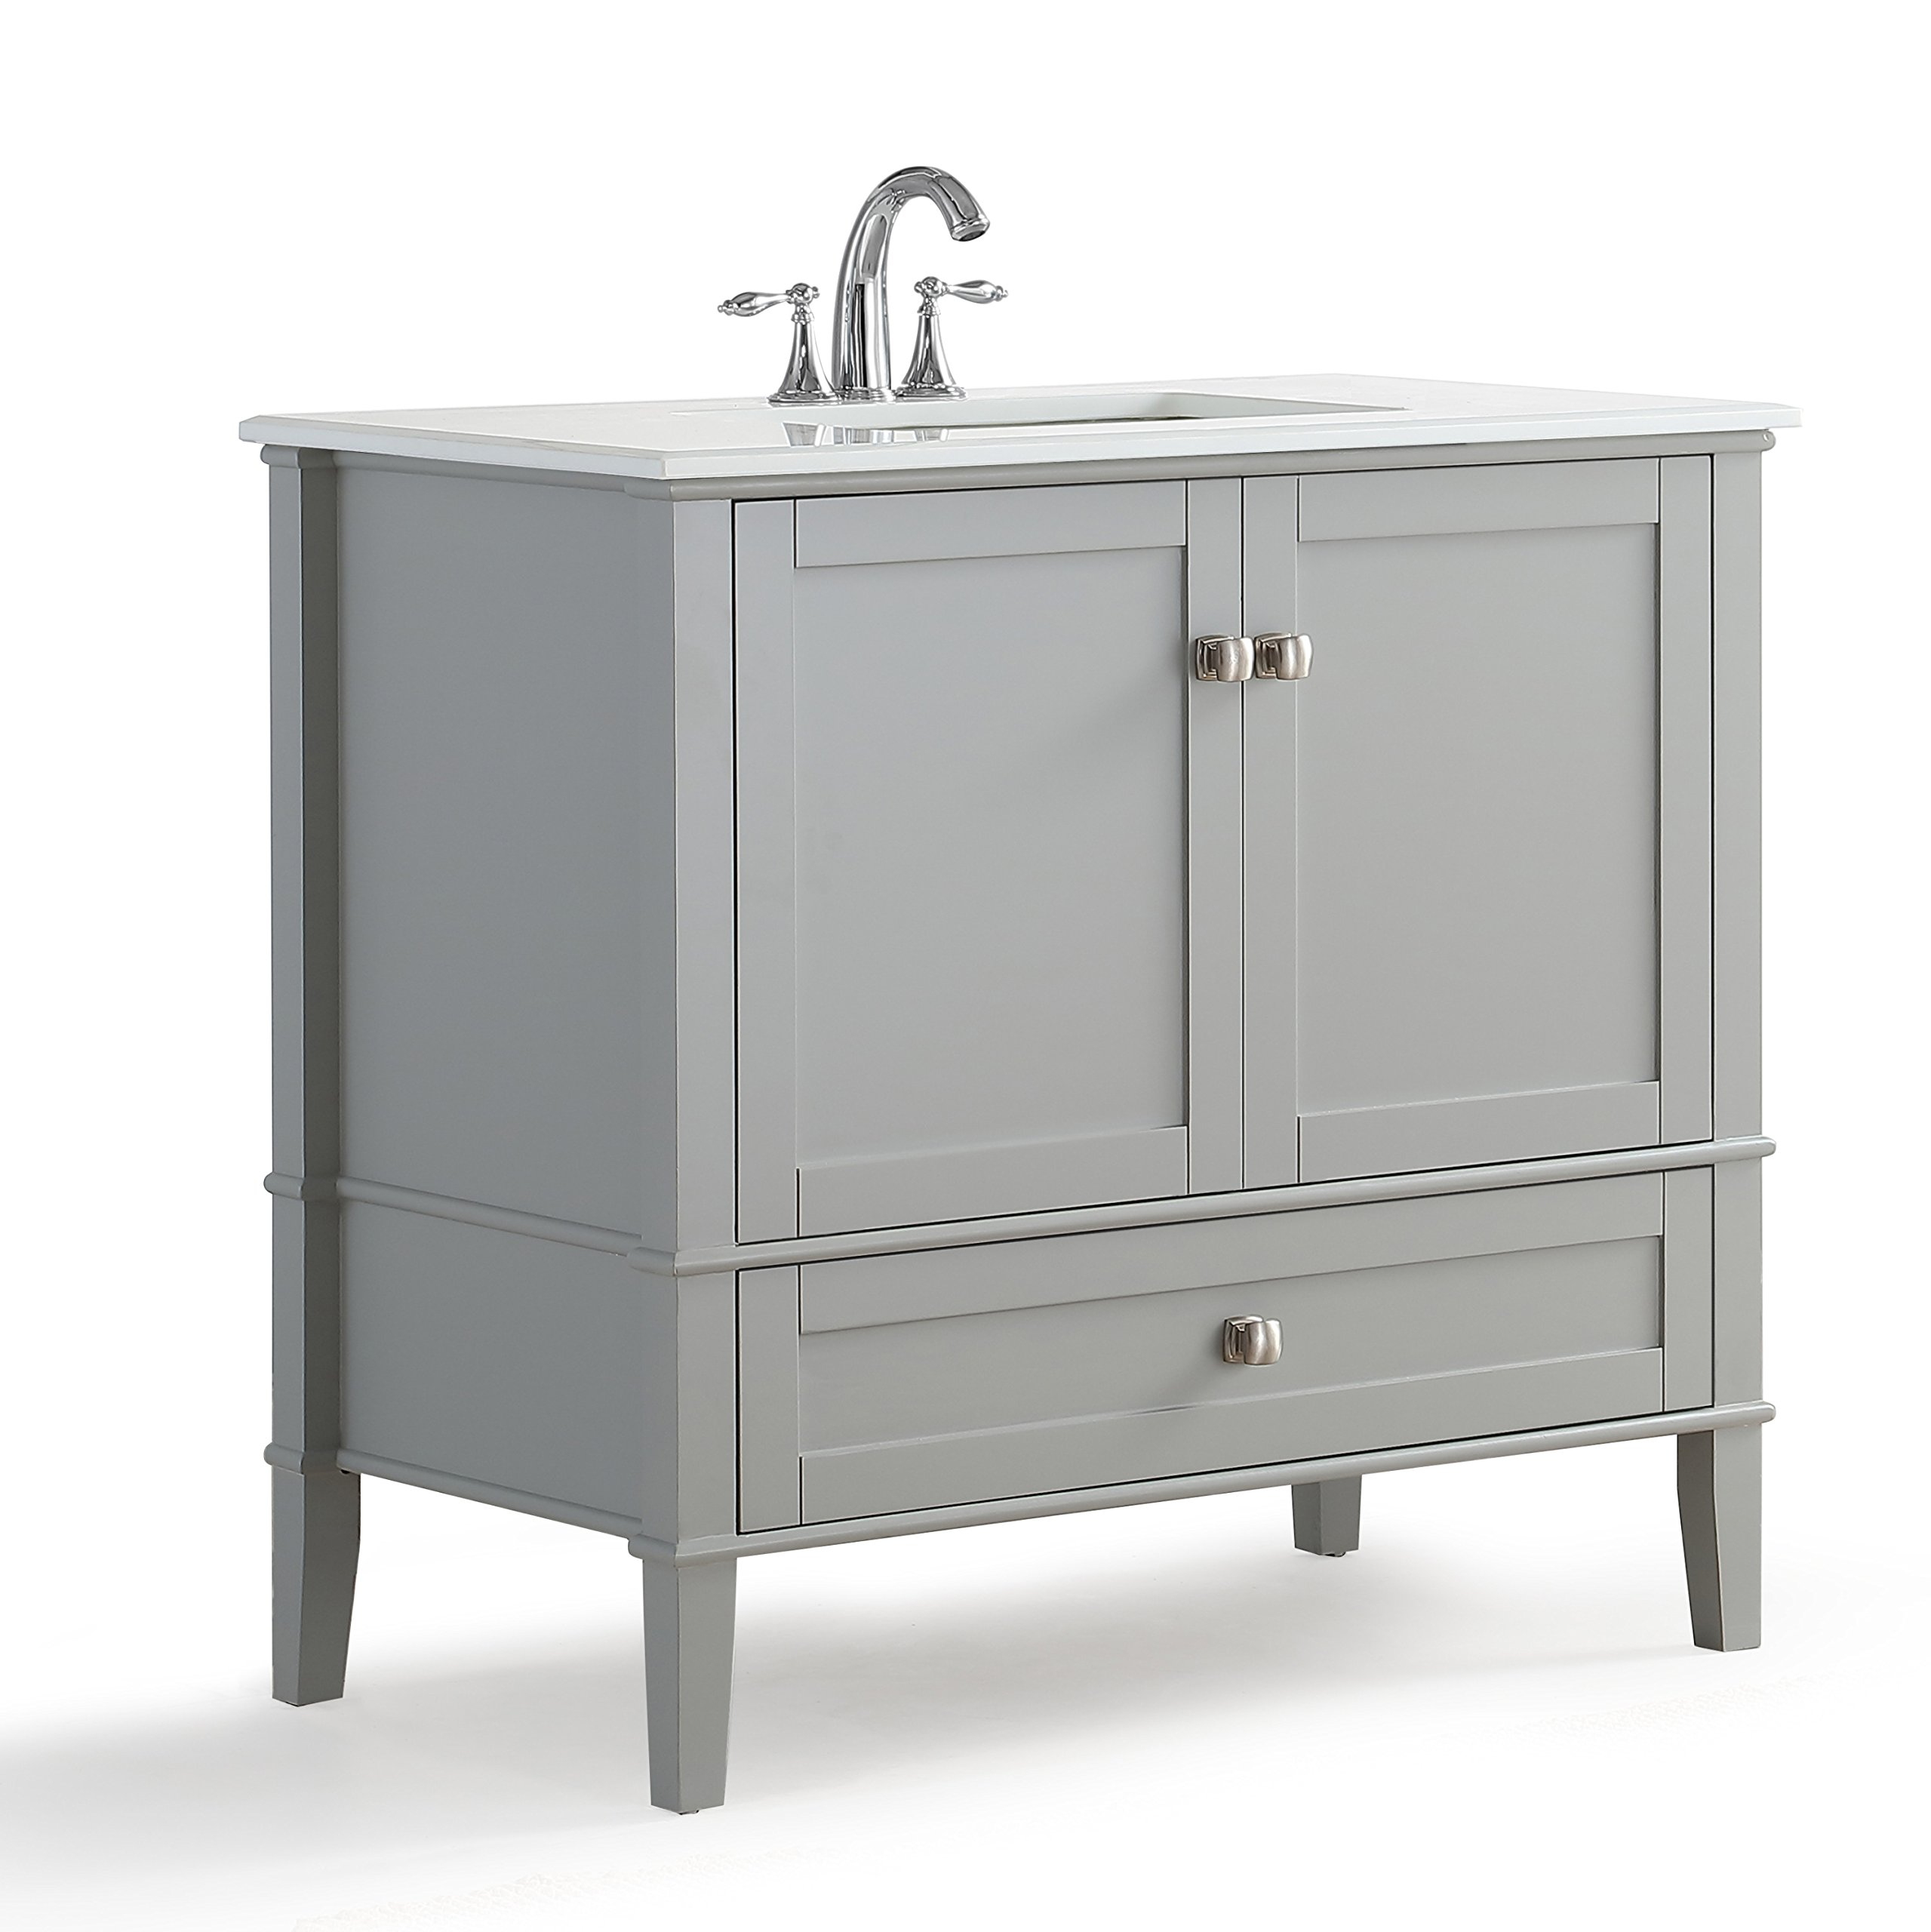 Simpli Home Chelsea 36 inch Bath Vanity with White Quartz Marble Top, Grey